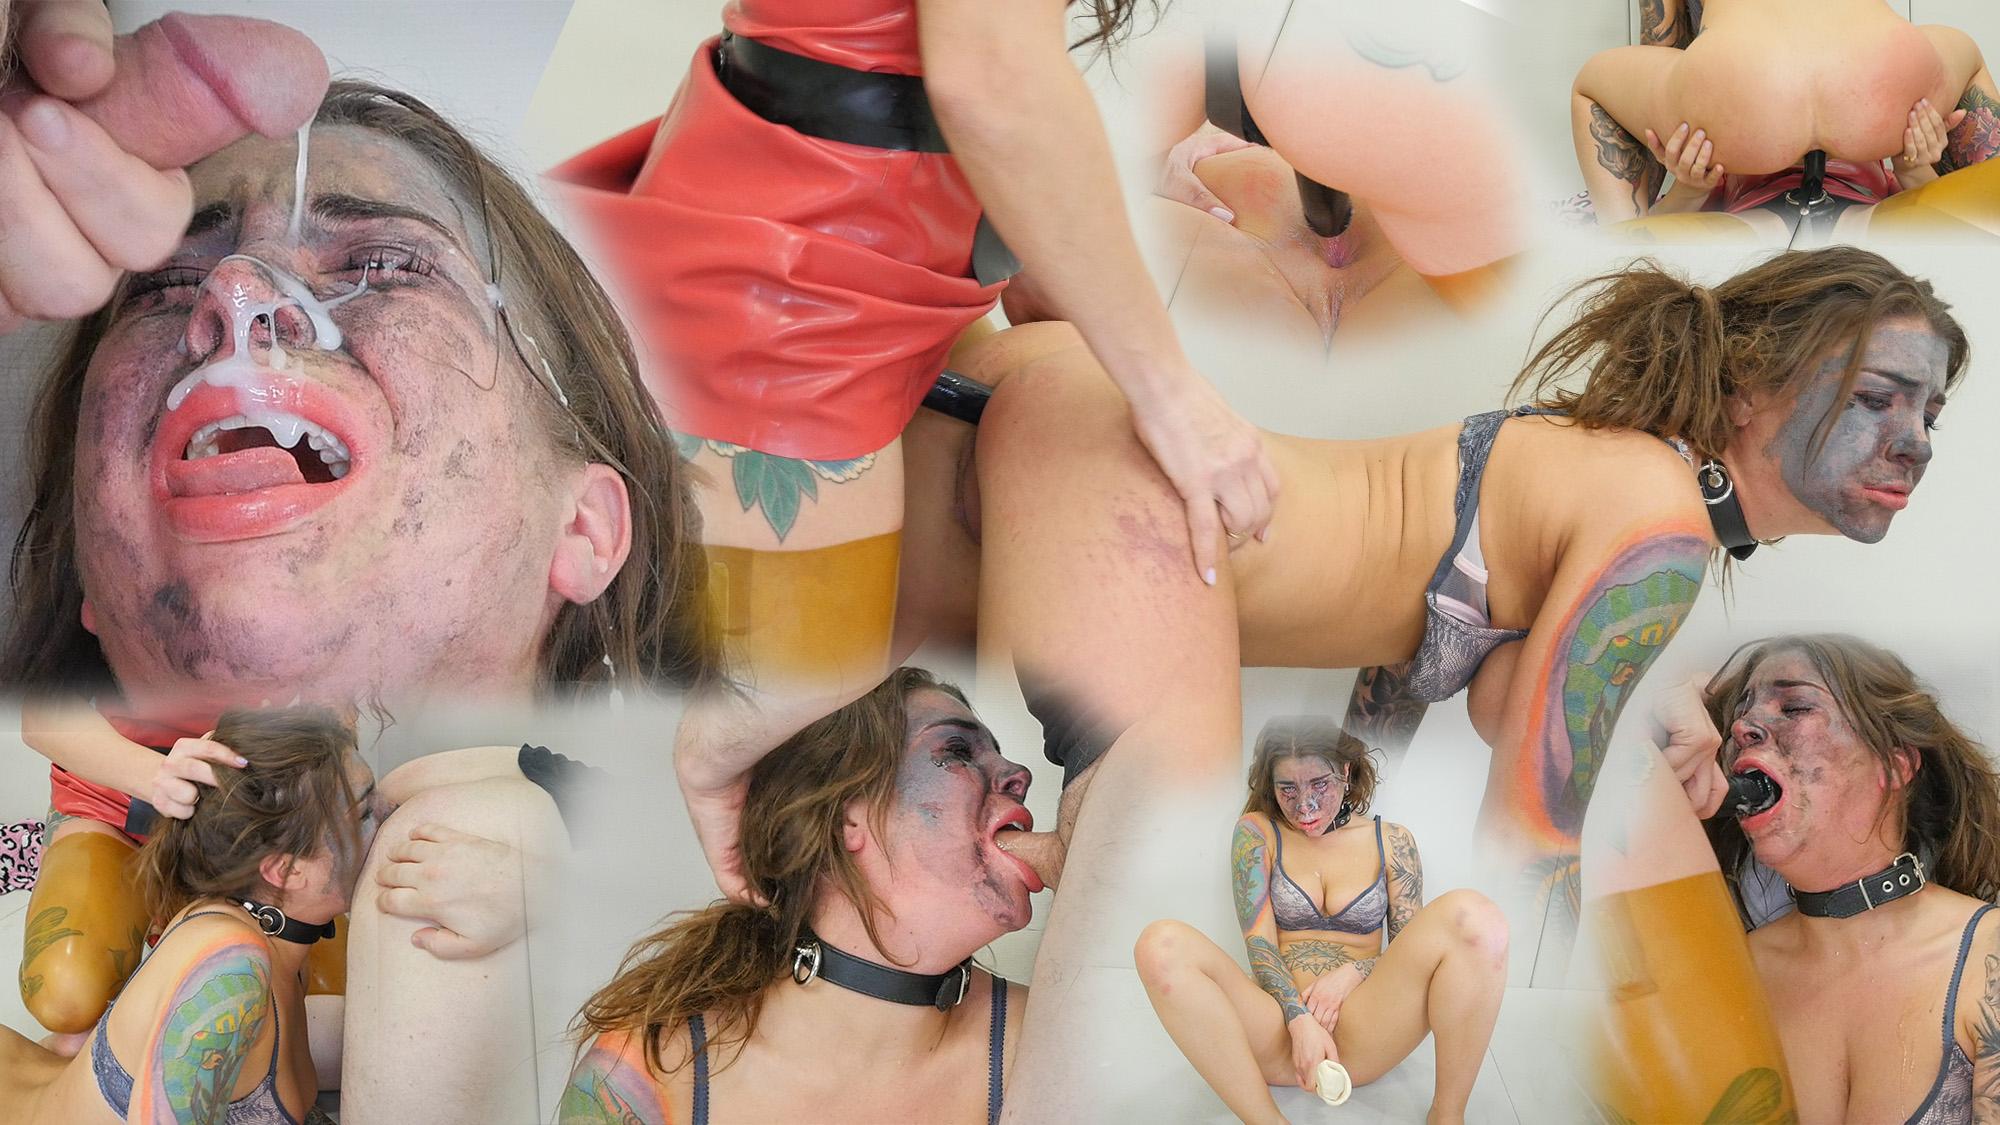 Assylum Porn Movies felicity feline nurse holl in assylum assie 2: sick anal